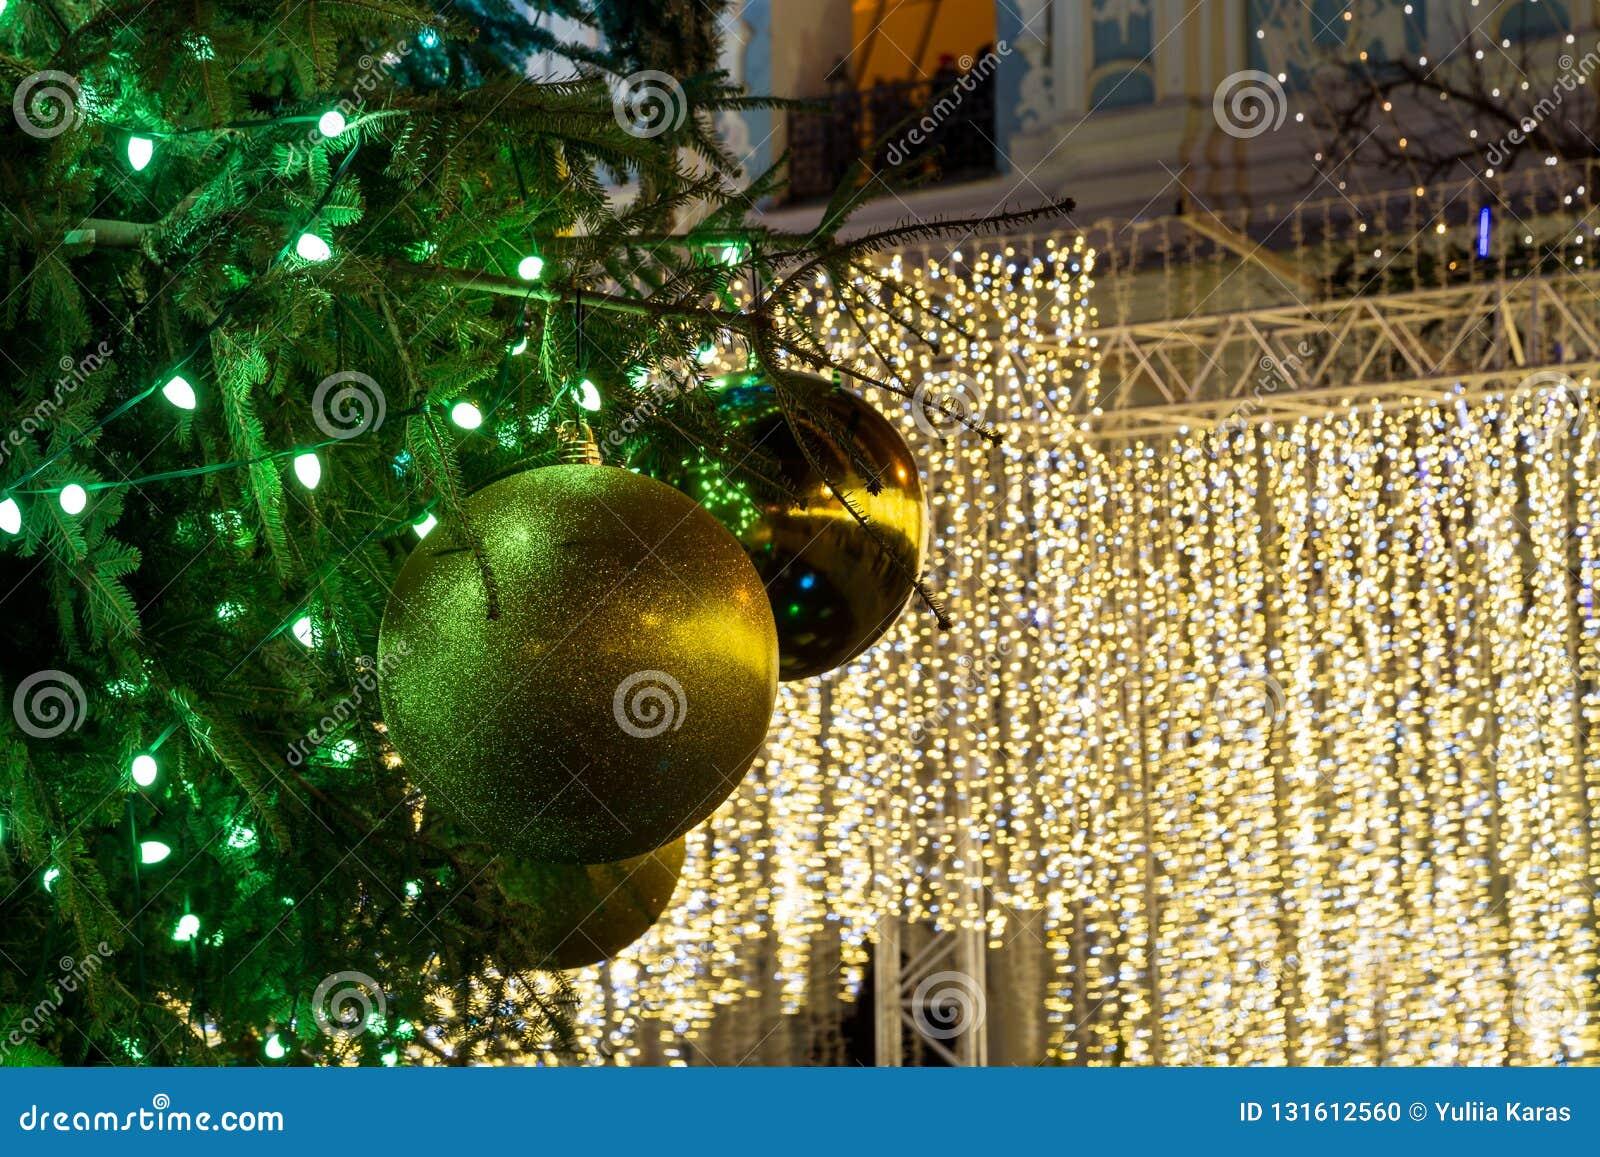 Christmas Tree Decorated With Lights At Night Kiev Ukraine